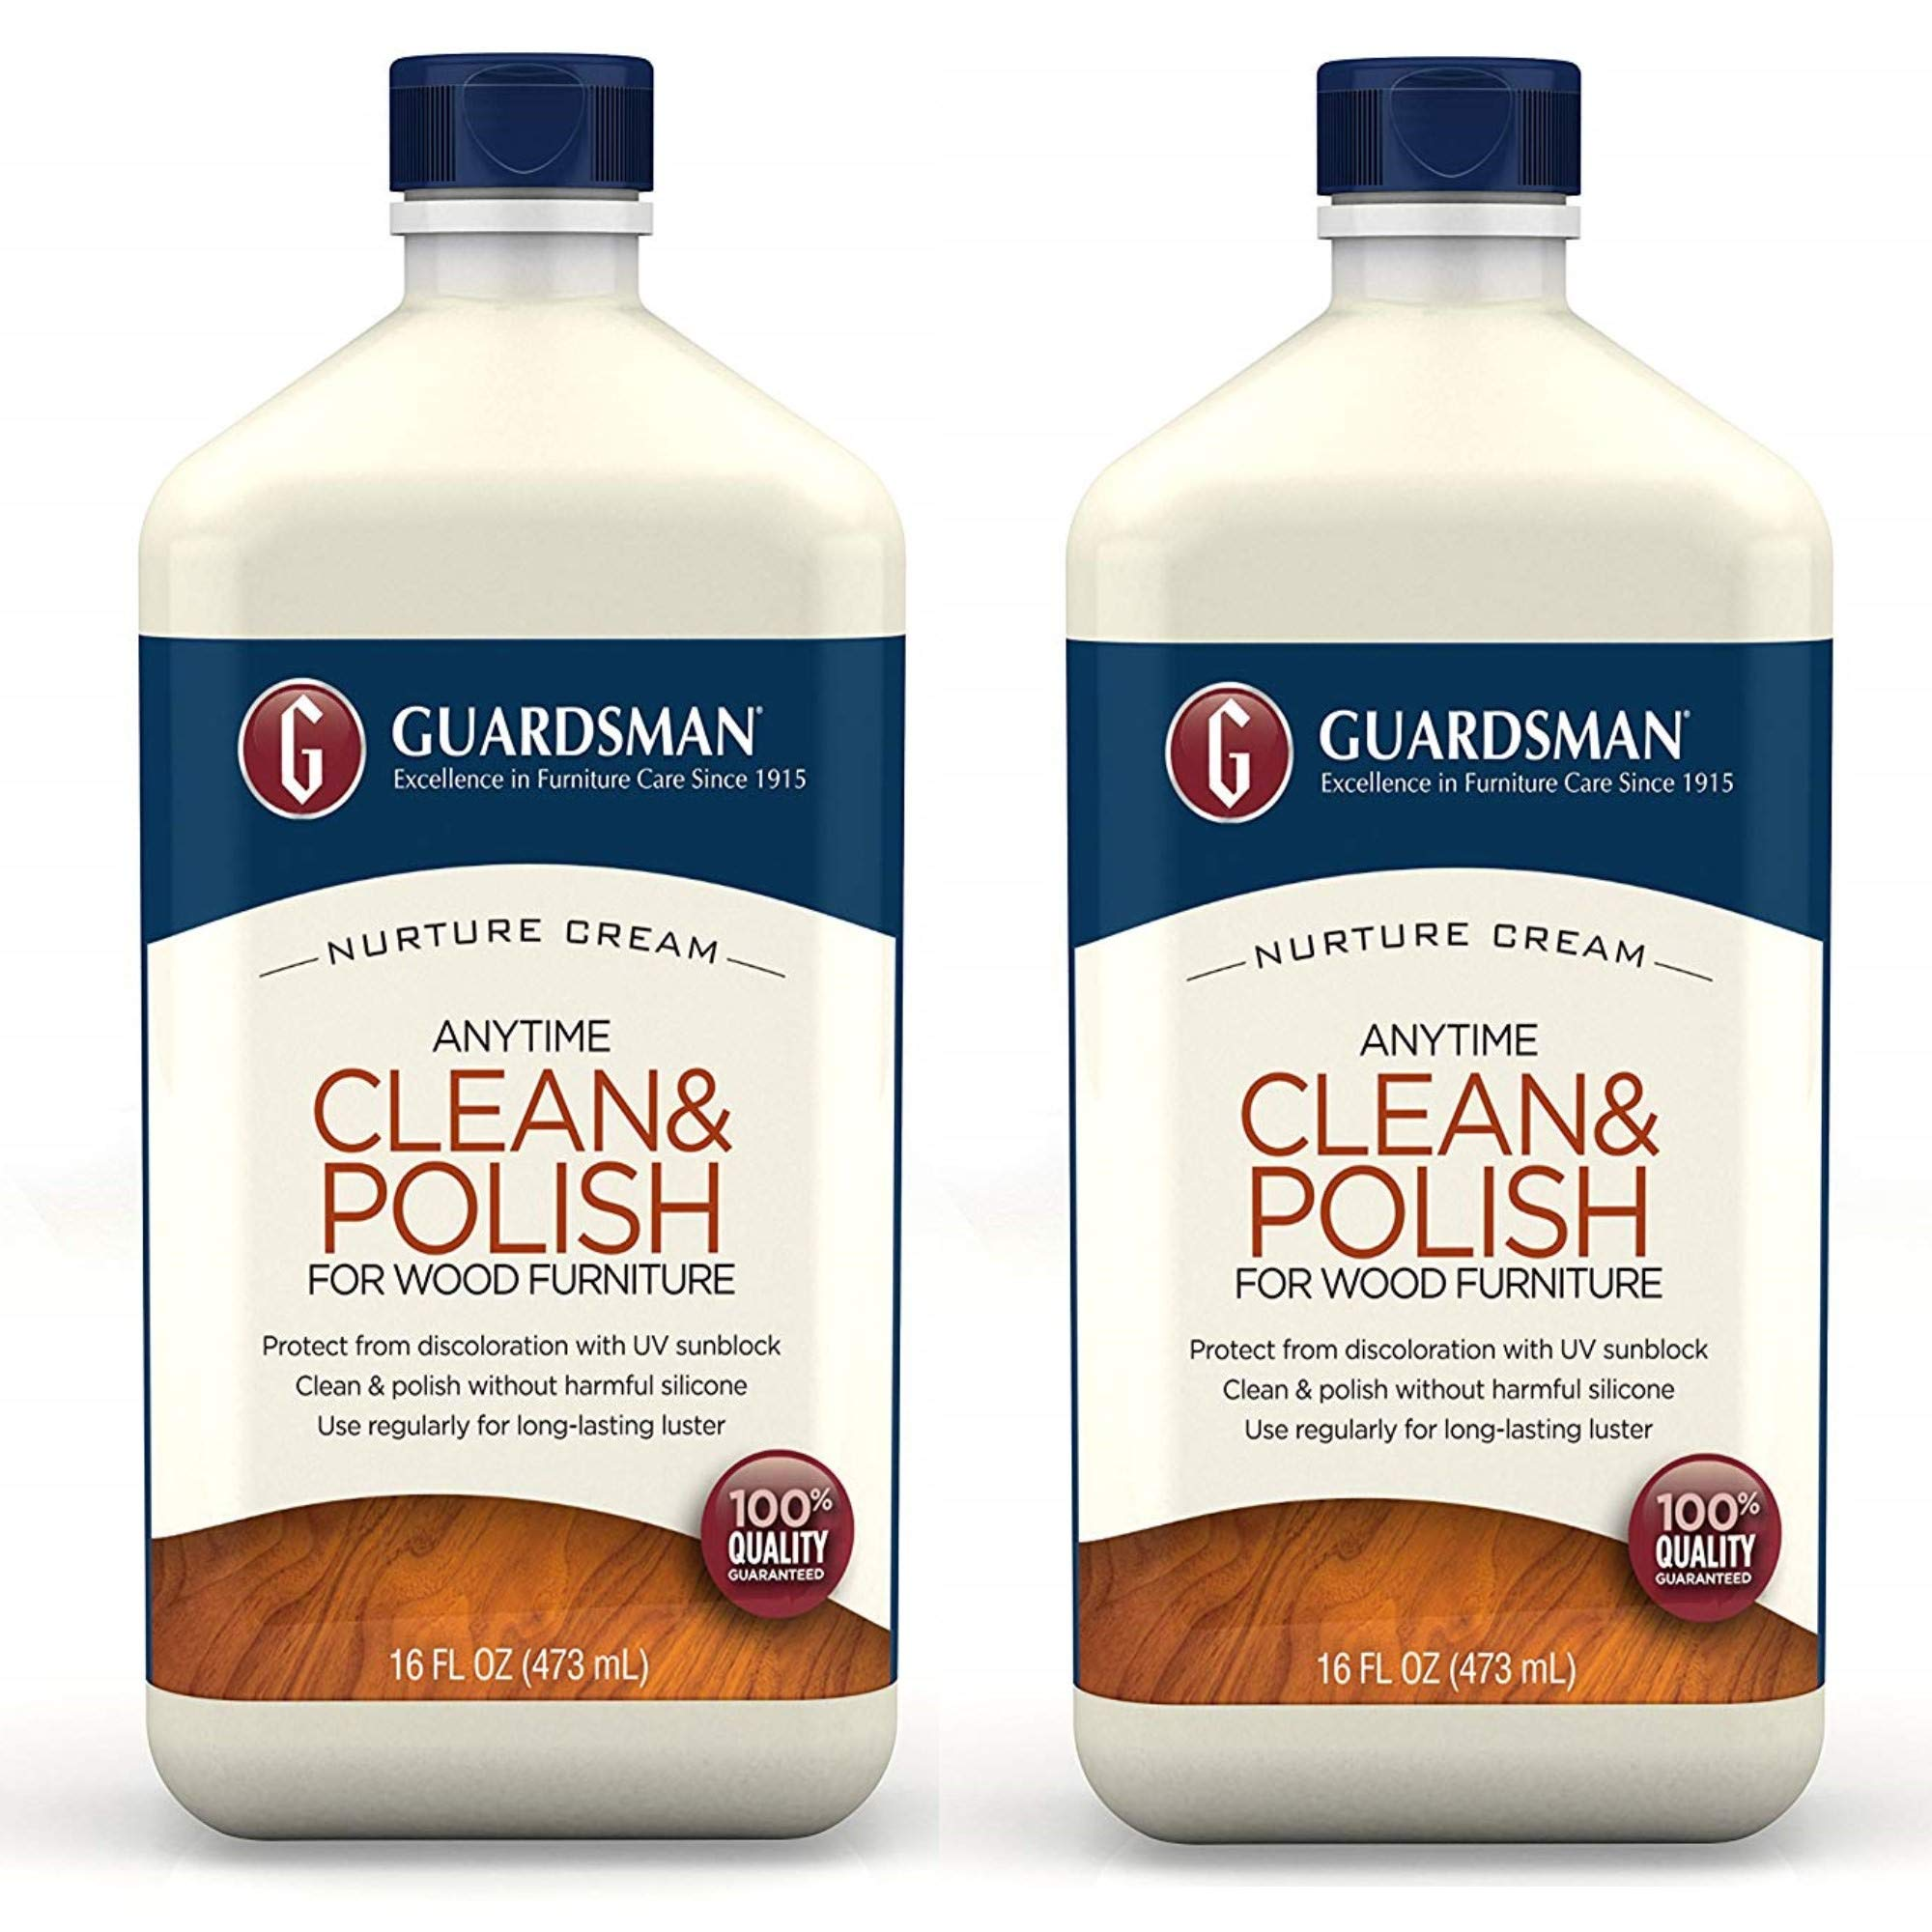 Guardsman Clean & Polish For Wood Furniture - Cream Polish 16 oz - Silicone Free, UV Protection - 461500-2 PACK